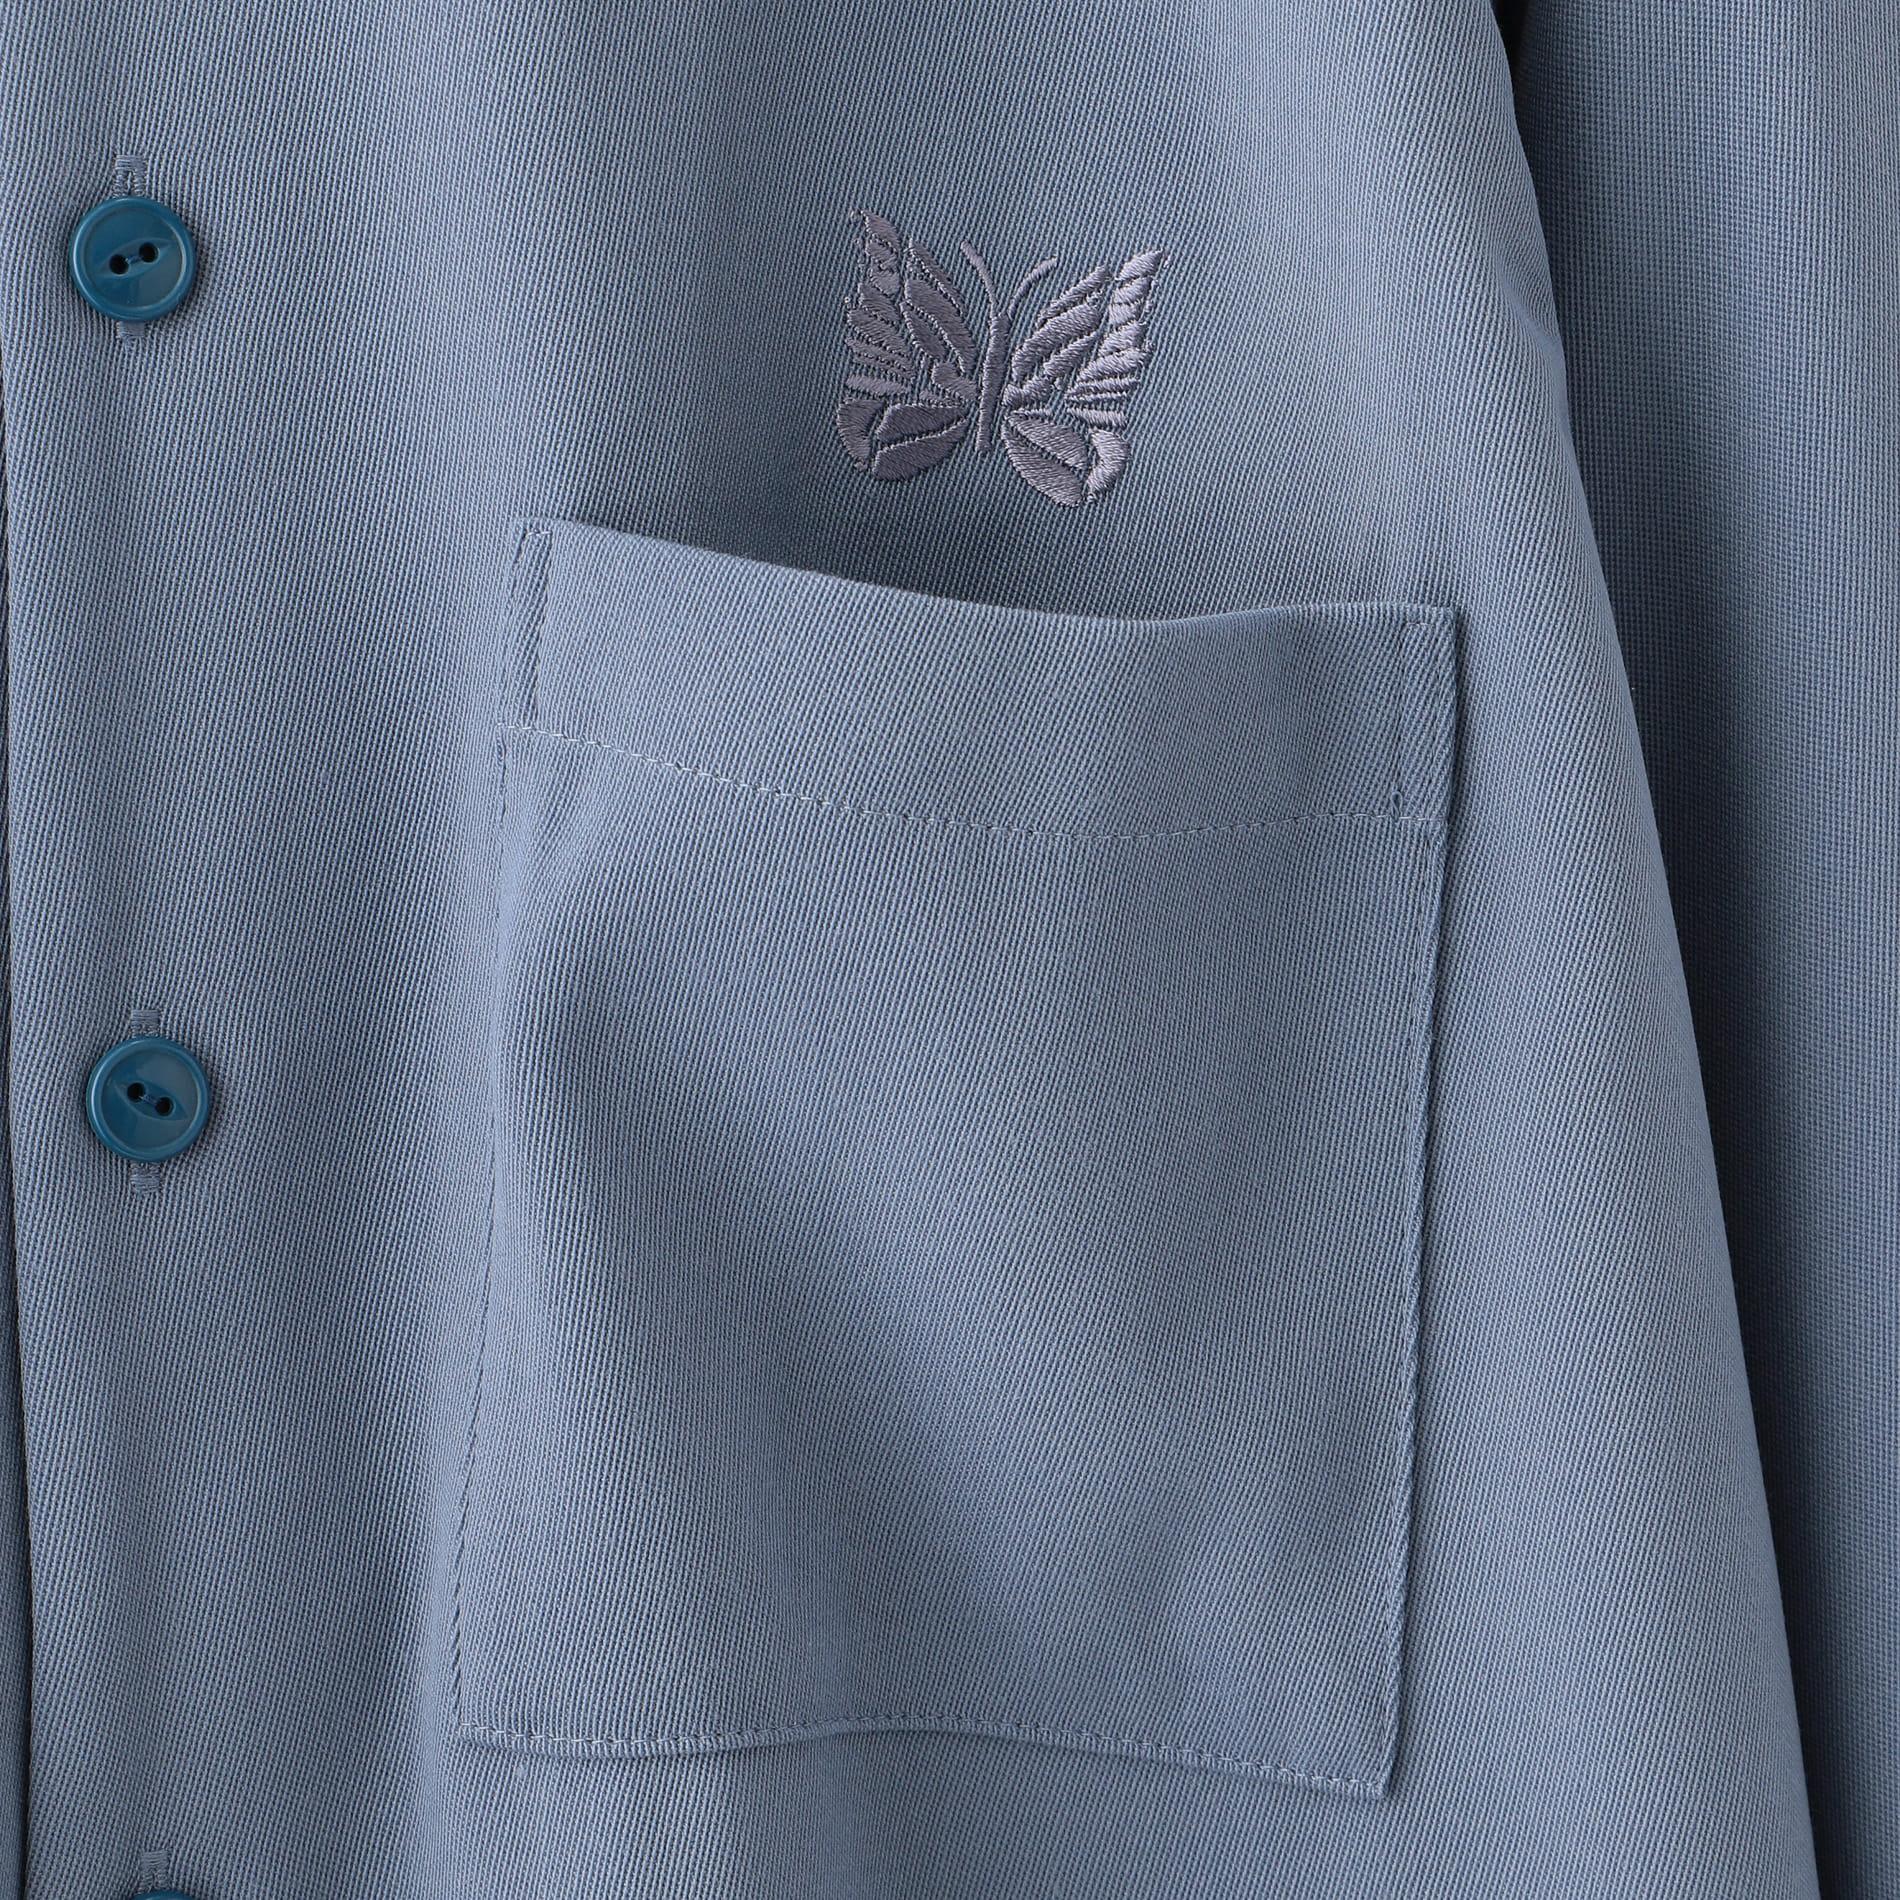 【Needles】MEN C.O.B. One-Up Shirt - Pe/W Doeskin HM158